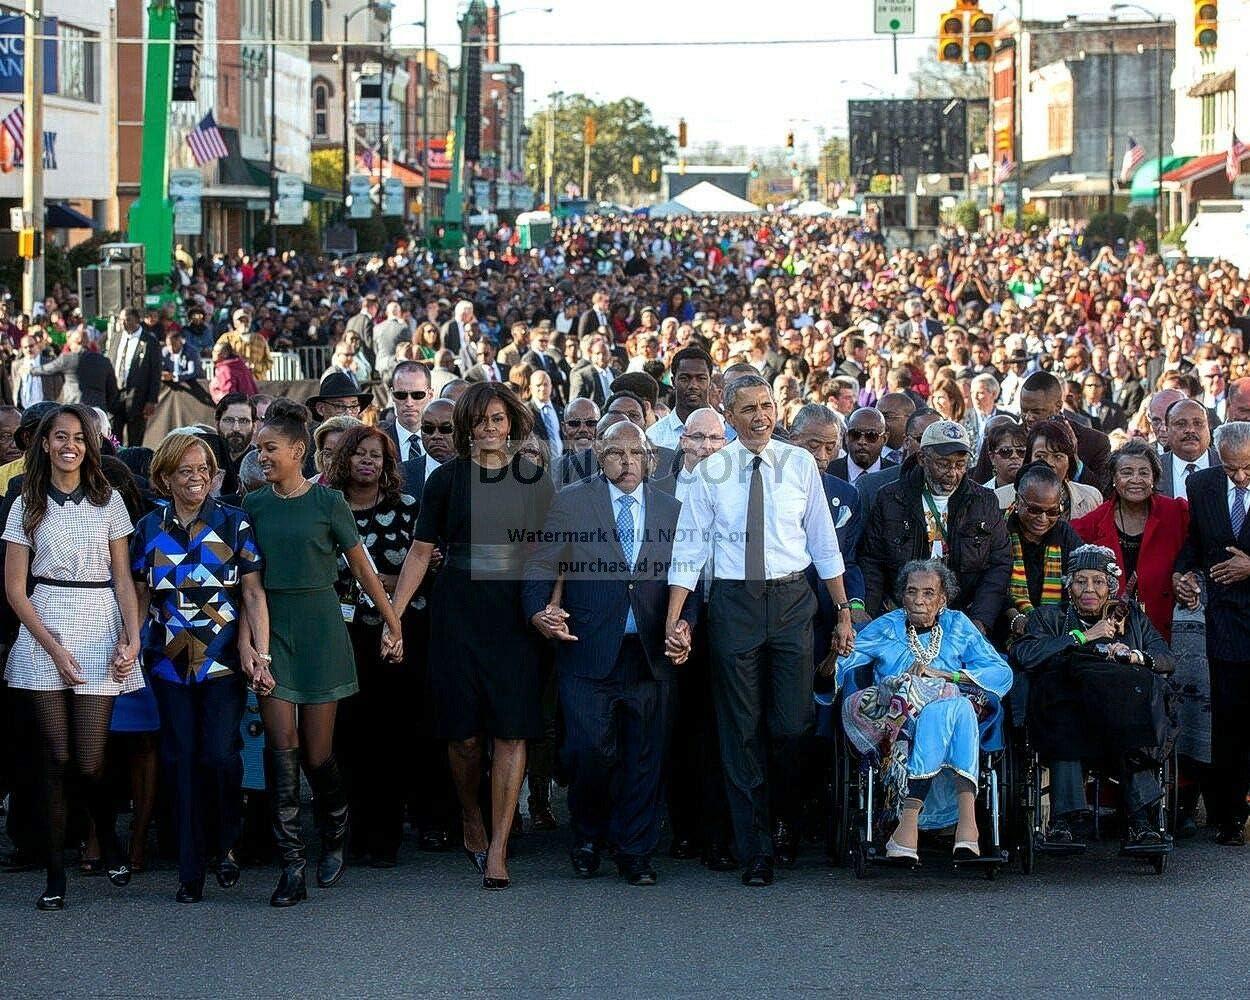 8X10 Photo bucraft Barack Obama /& John Lewis Walk Across Edmund Pettus Bridge ZZ-995